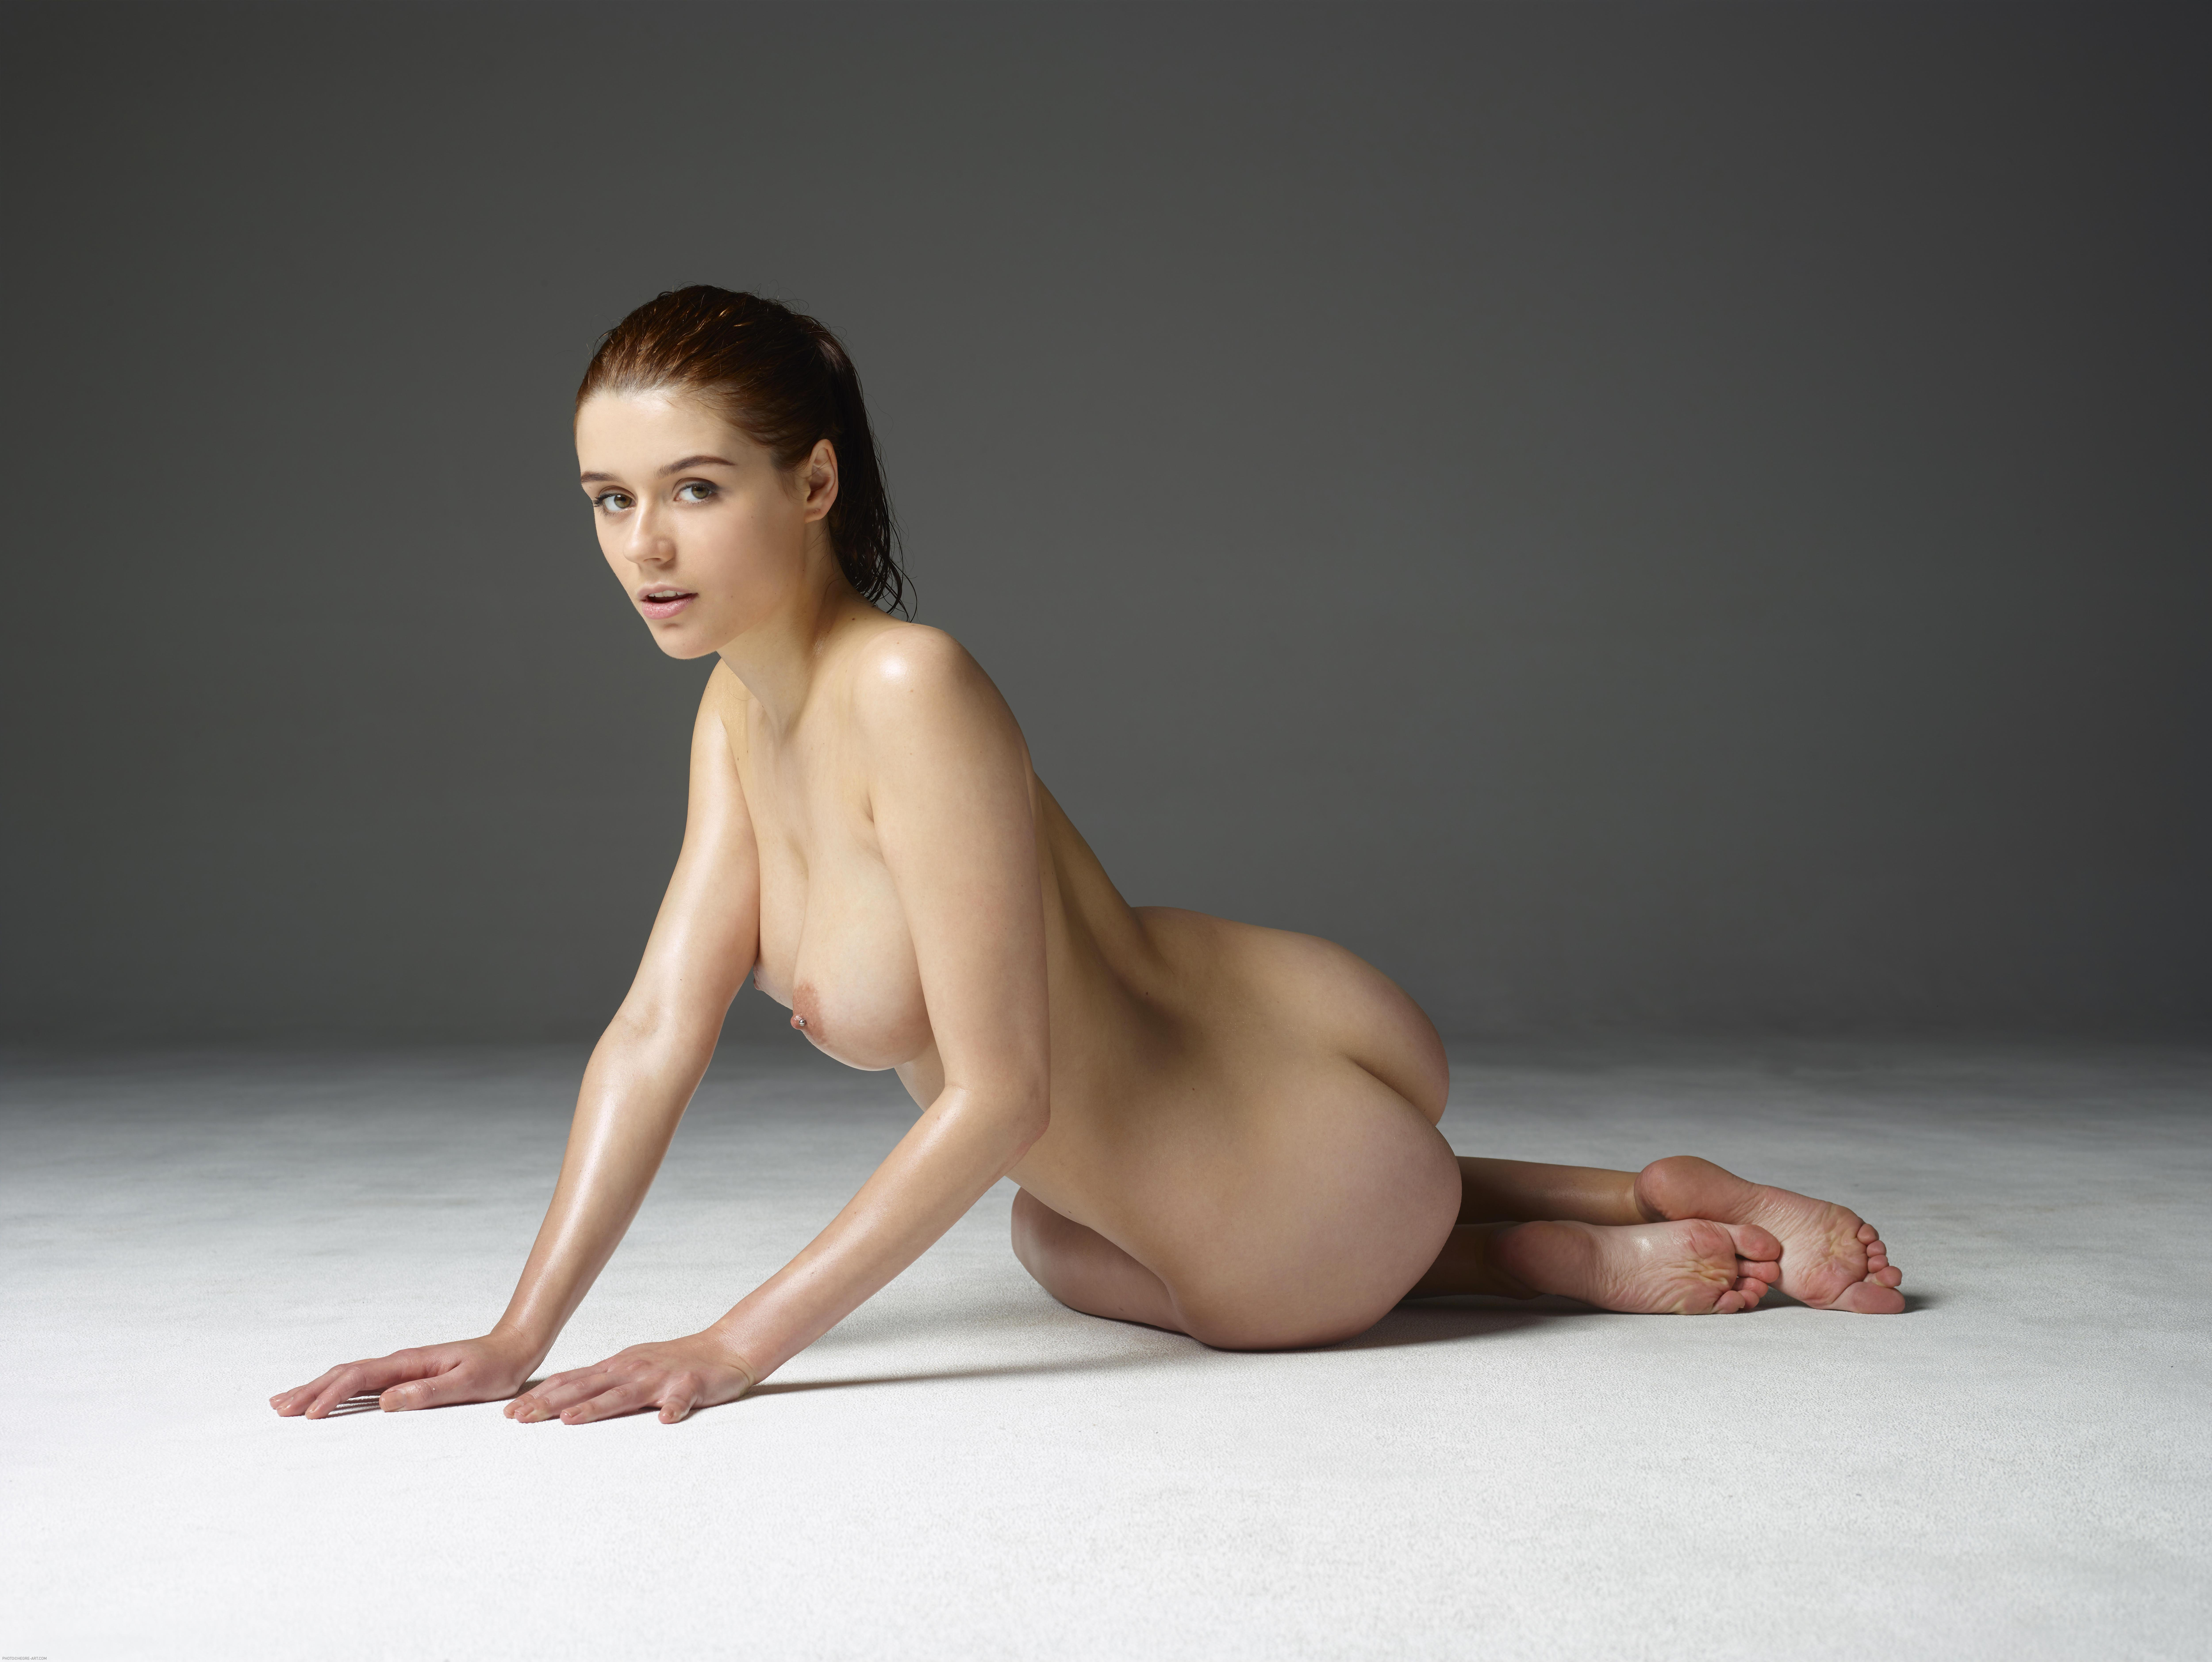 Nude minister female metronome